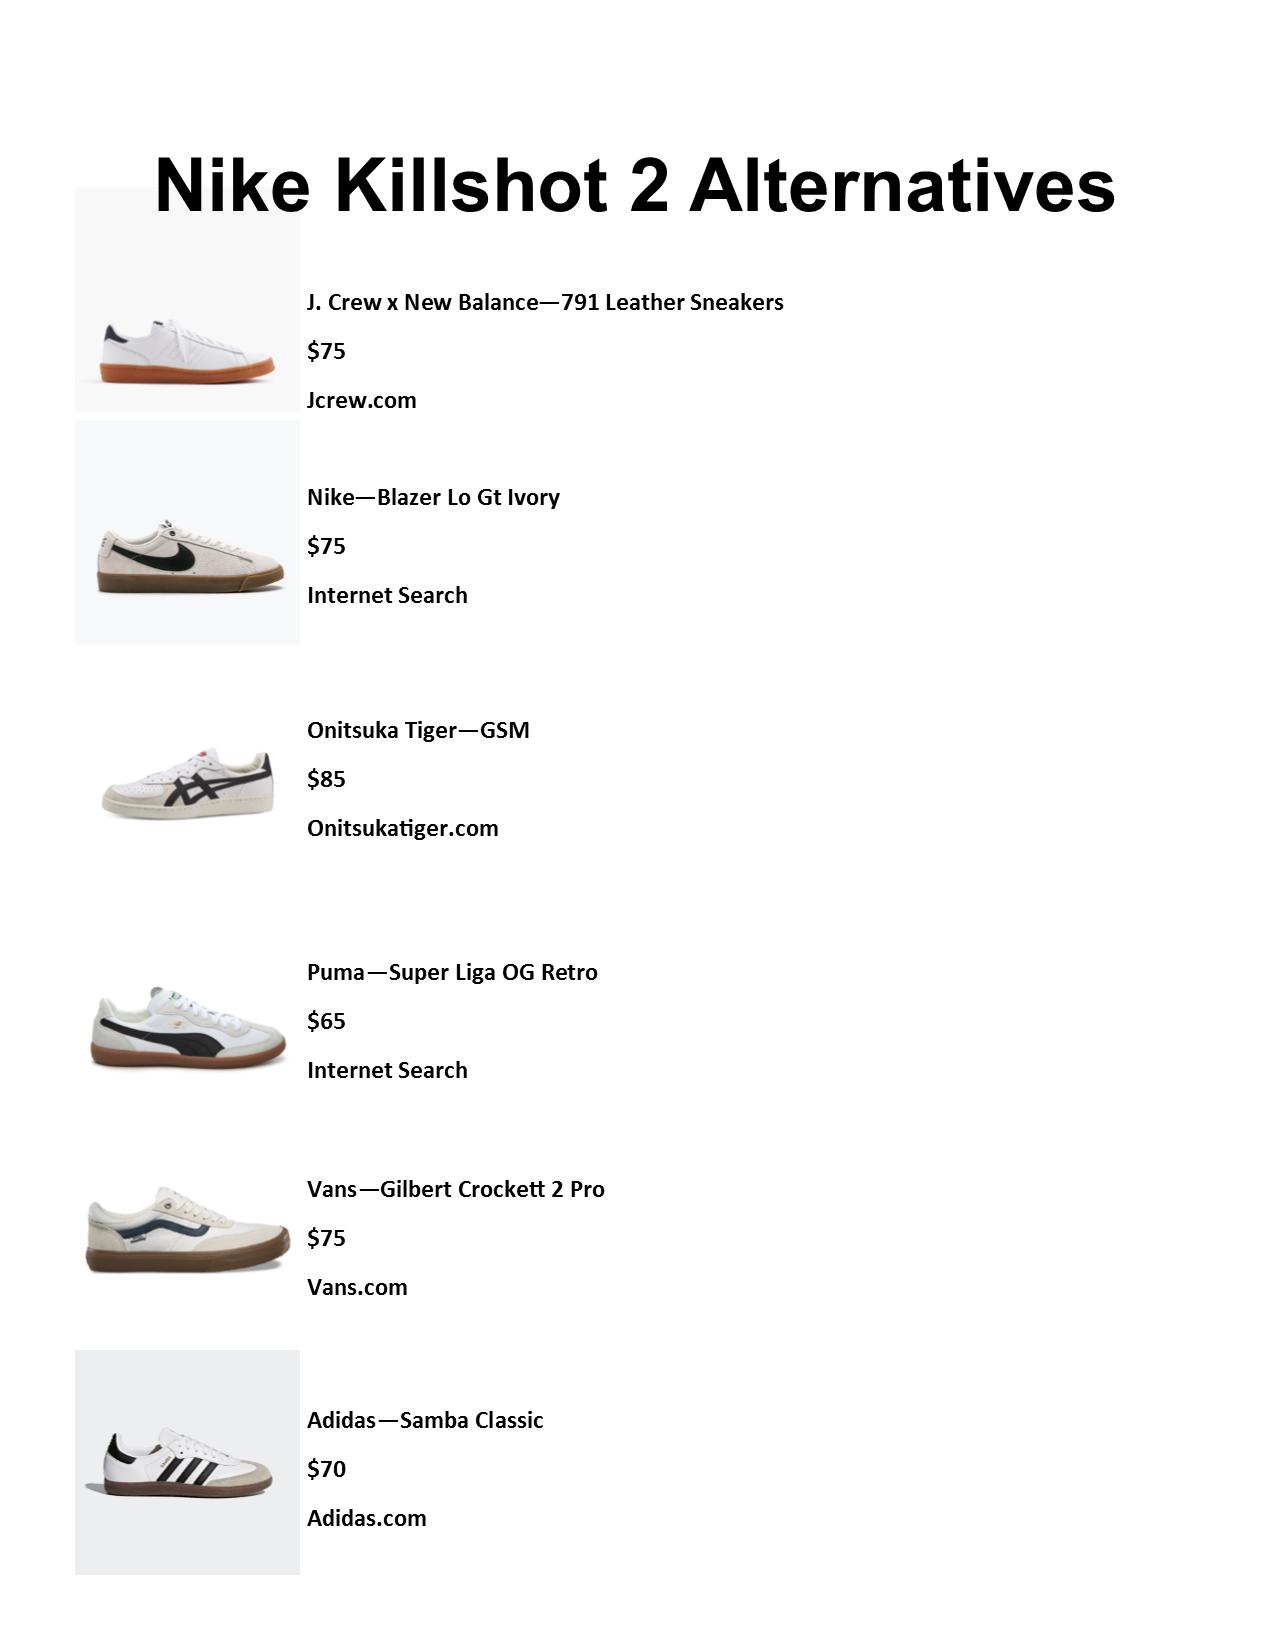 Bloquear Estallar Reunión  Nike Killshot 2 Alternatives #styled247   Nike killshot, Nike, Large men  fashion